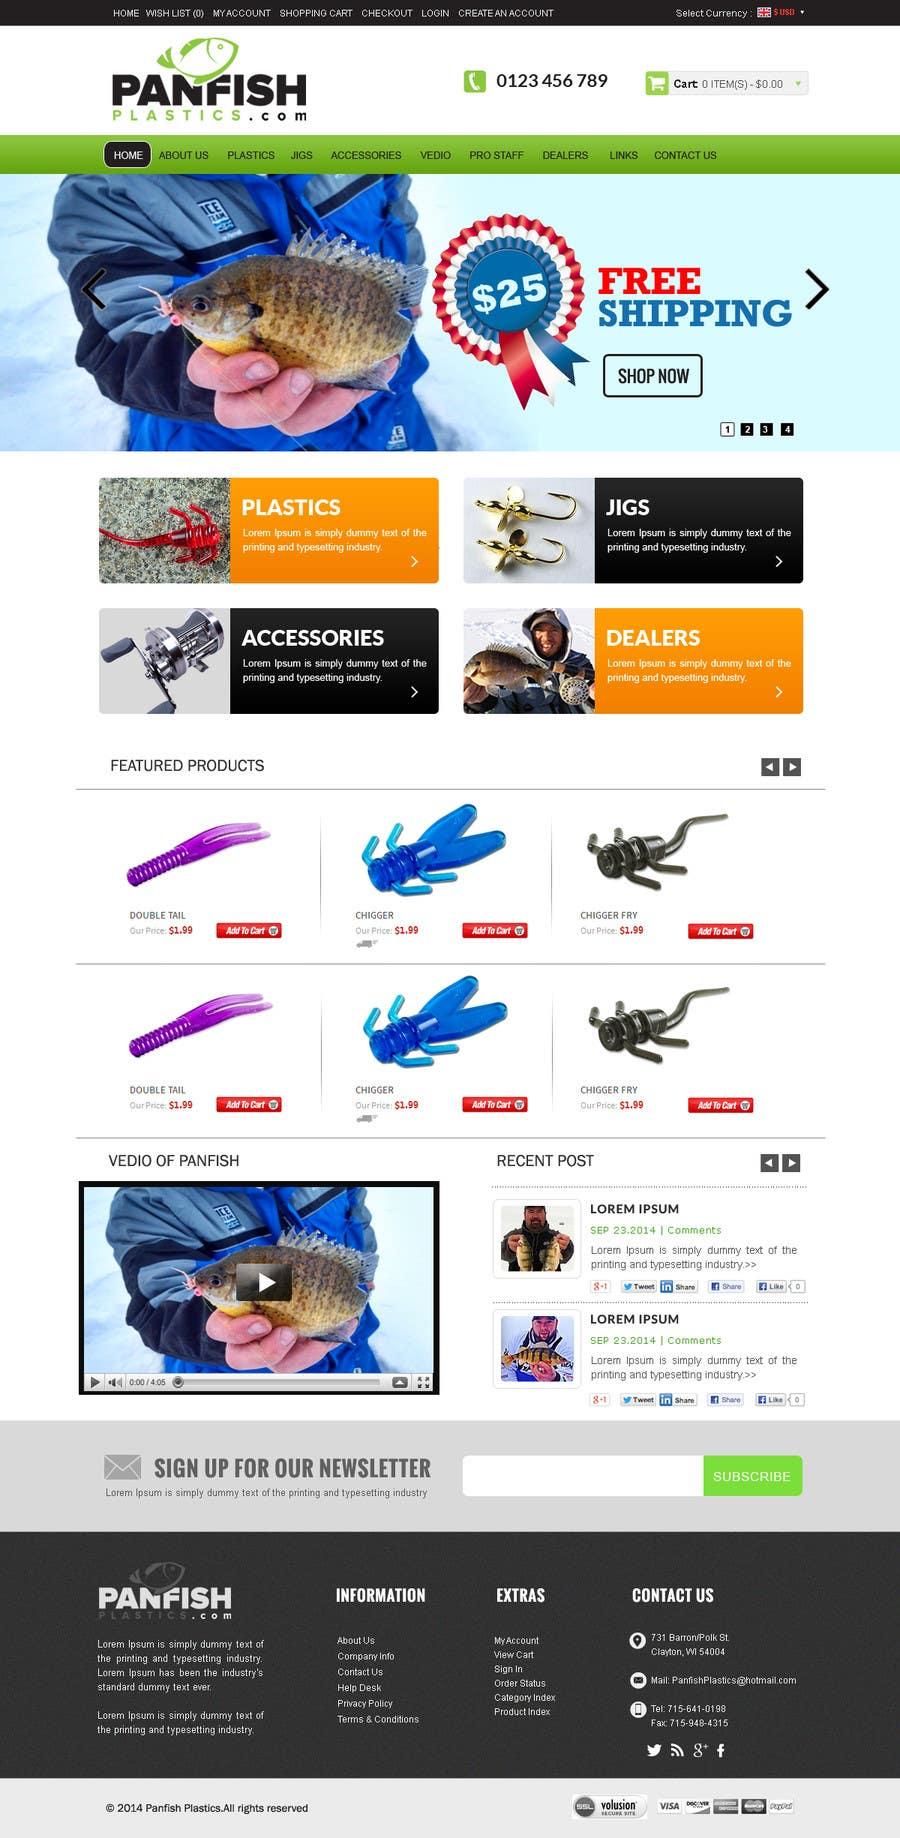 Penyertaan Peraduan #                                        31                                      untuk                                         Design a Website Mockup for ecommerce fishing store